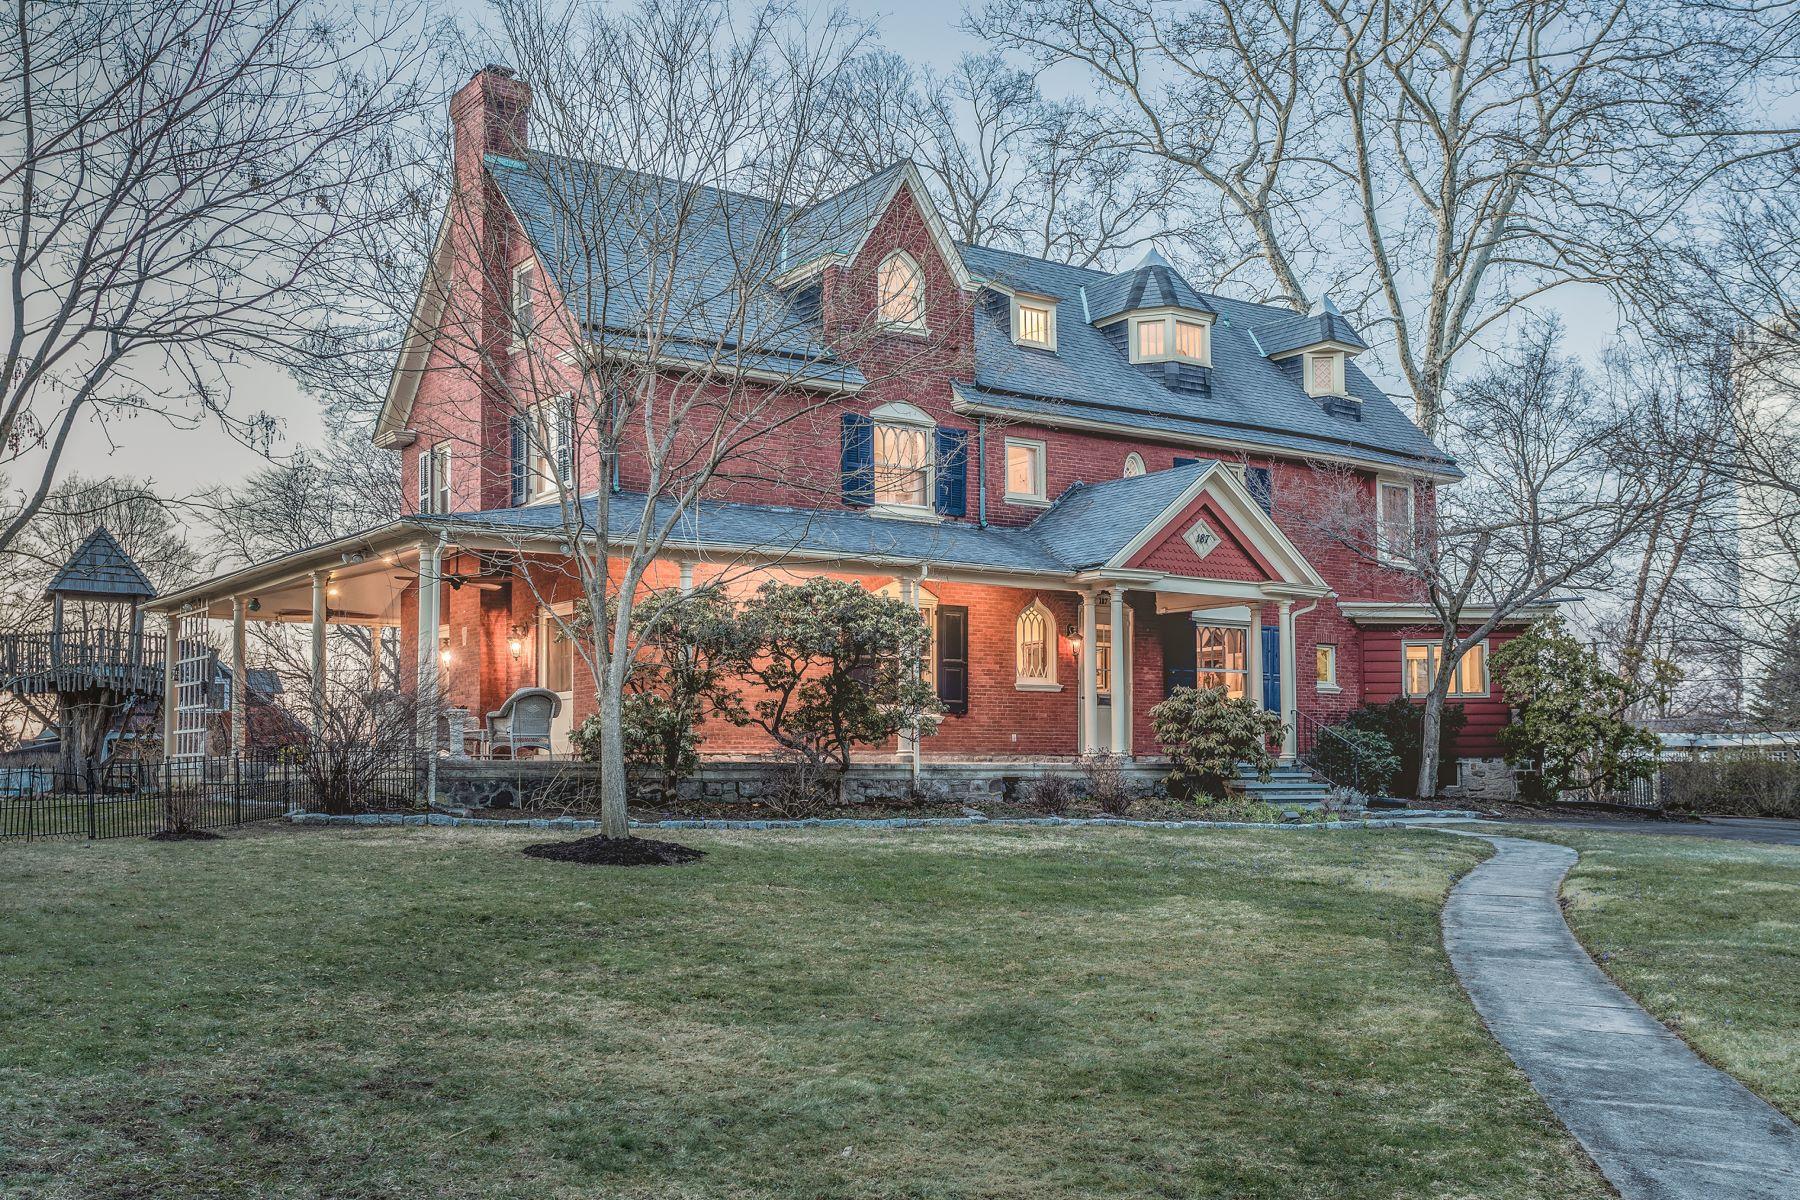 Single Family Home for Sale at Grand Dame of Doylestown 187 E COURT ST, Doylestown, Pennsylvania, 18901 United States